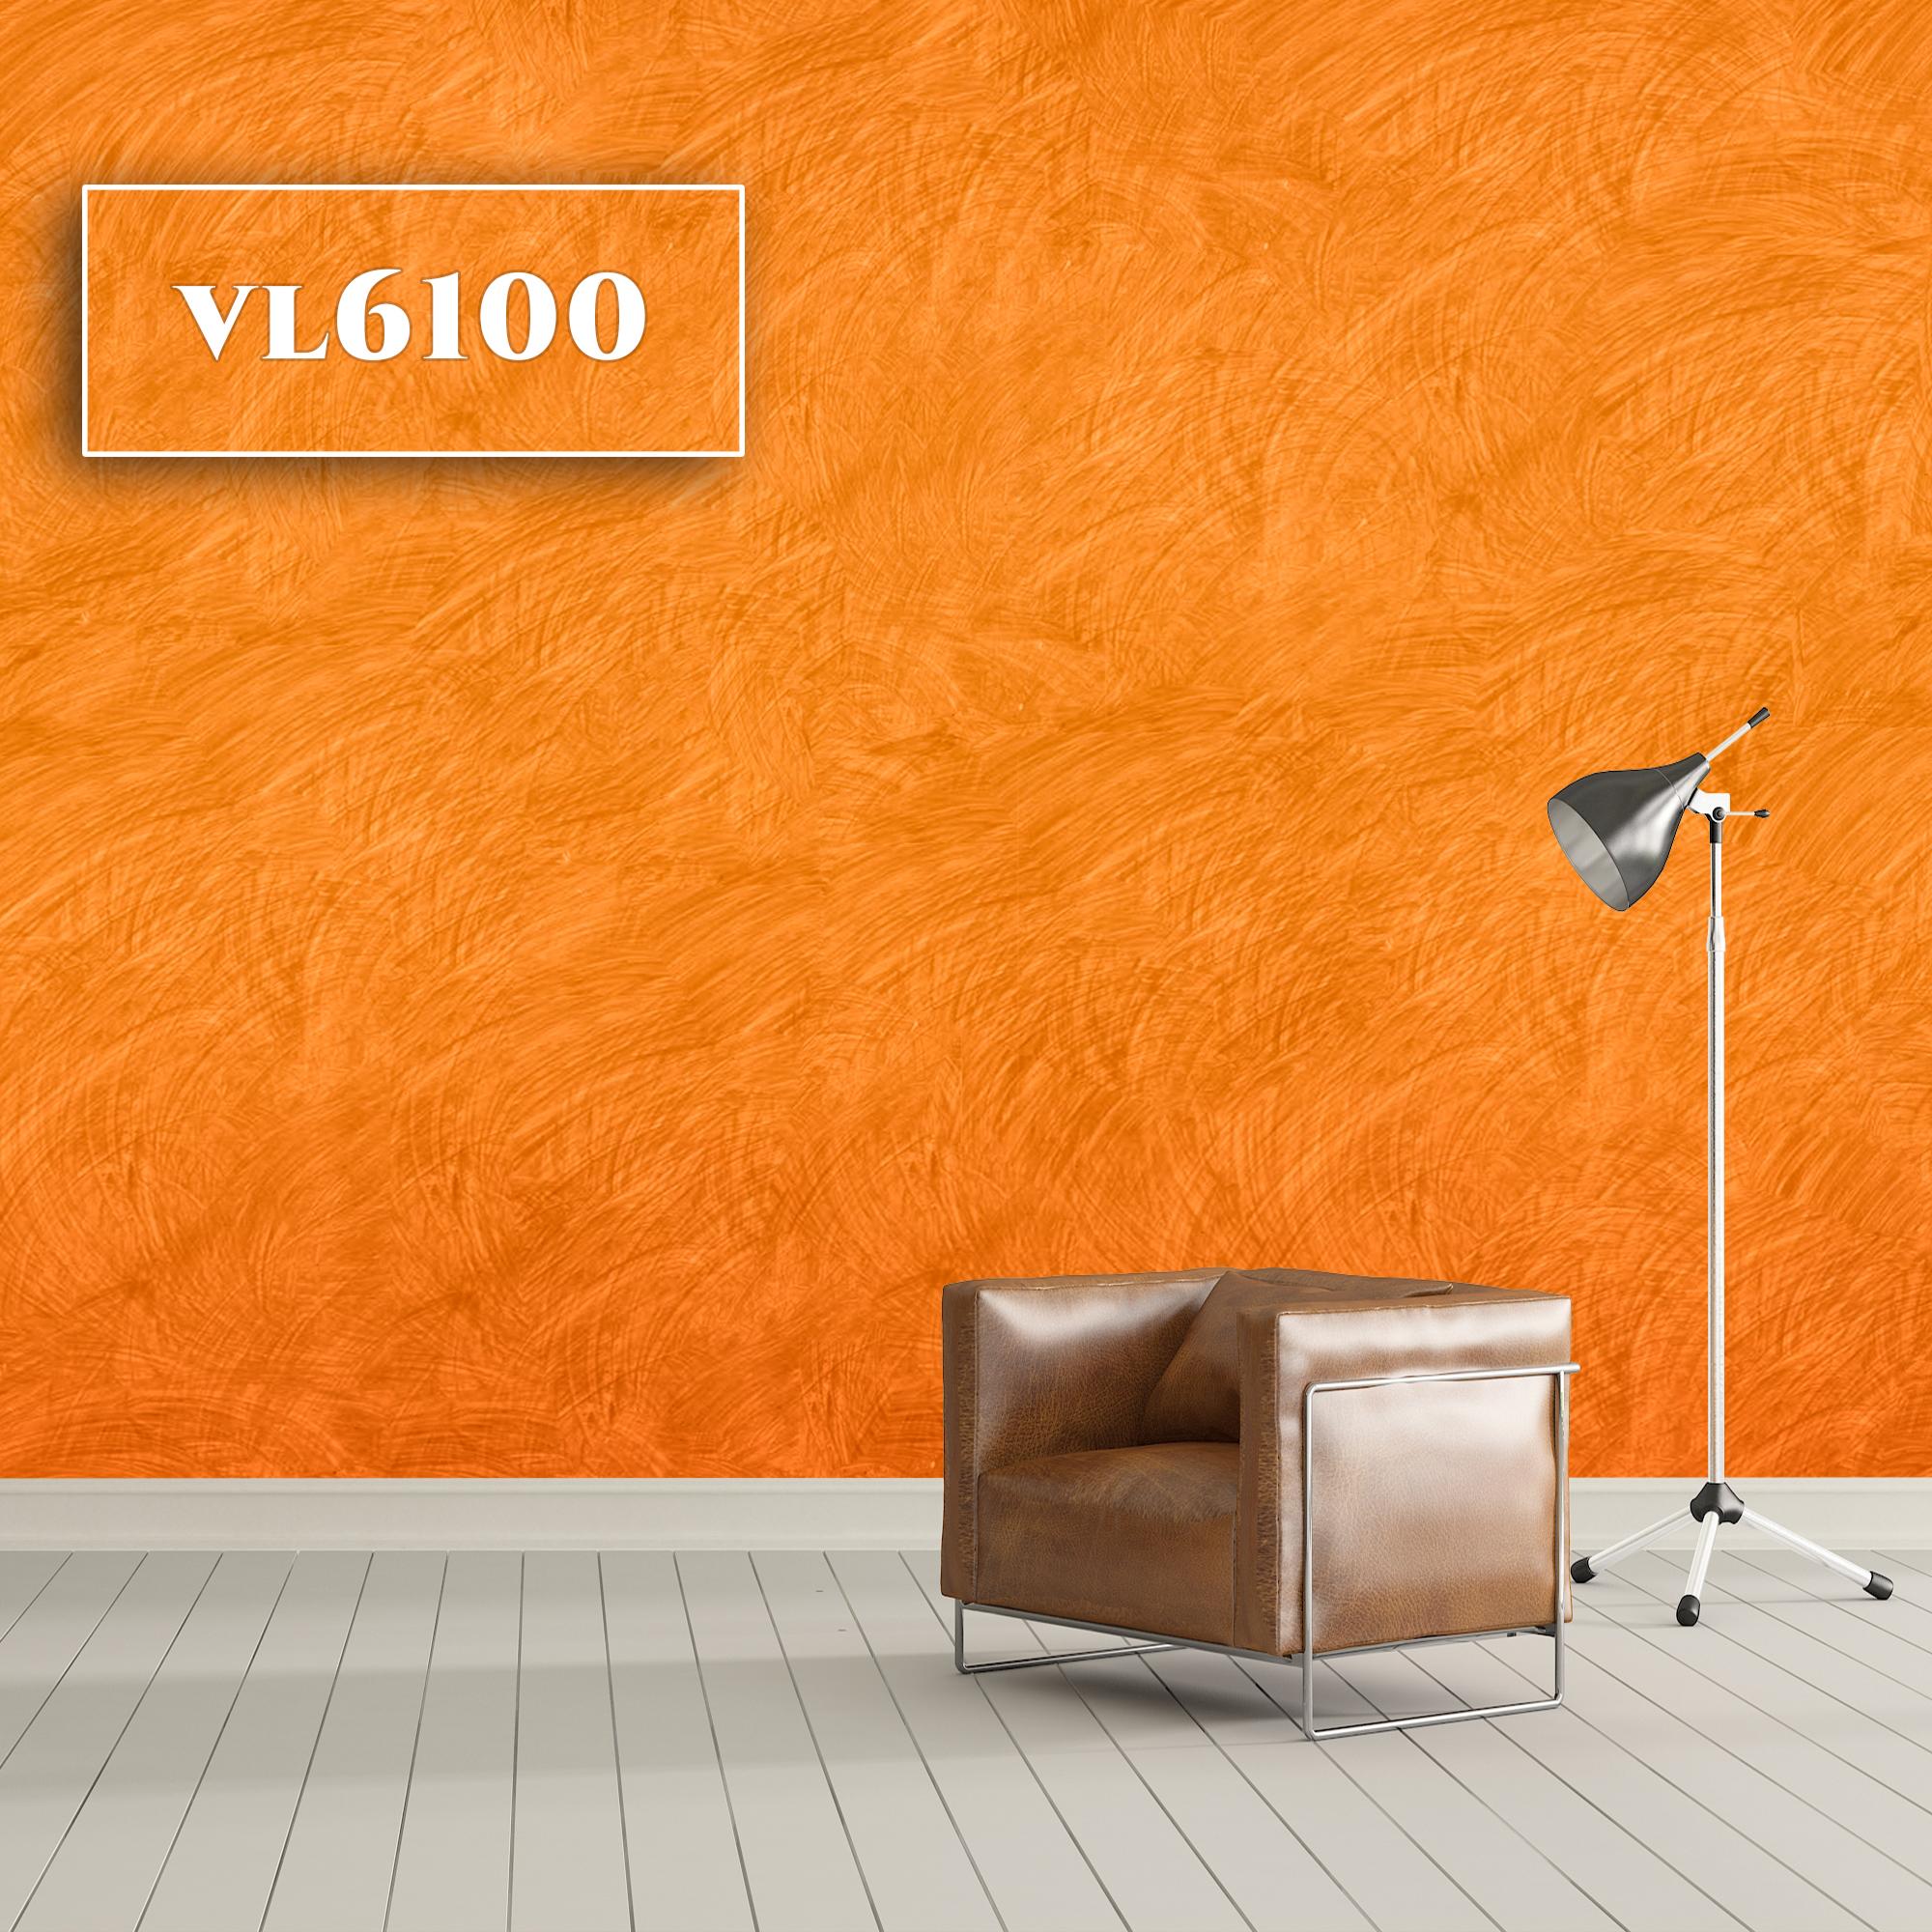 VL6100